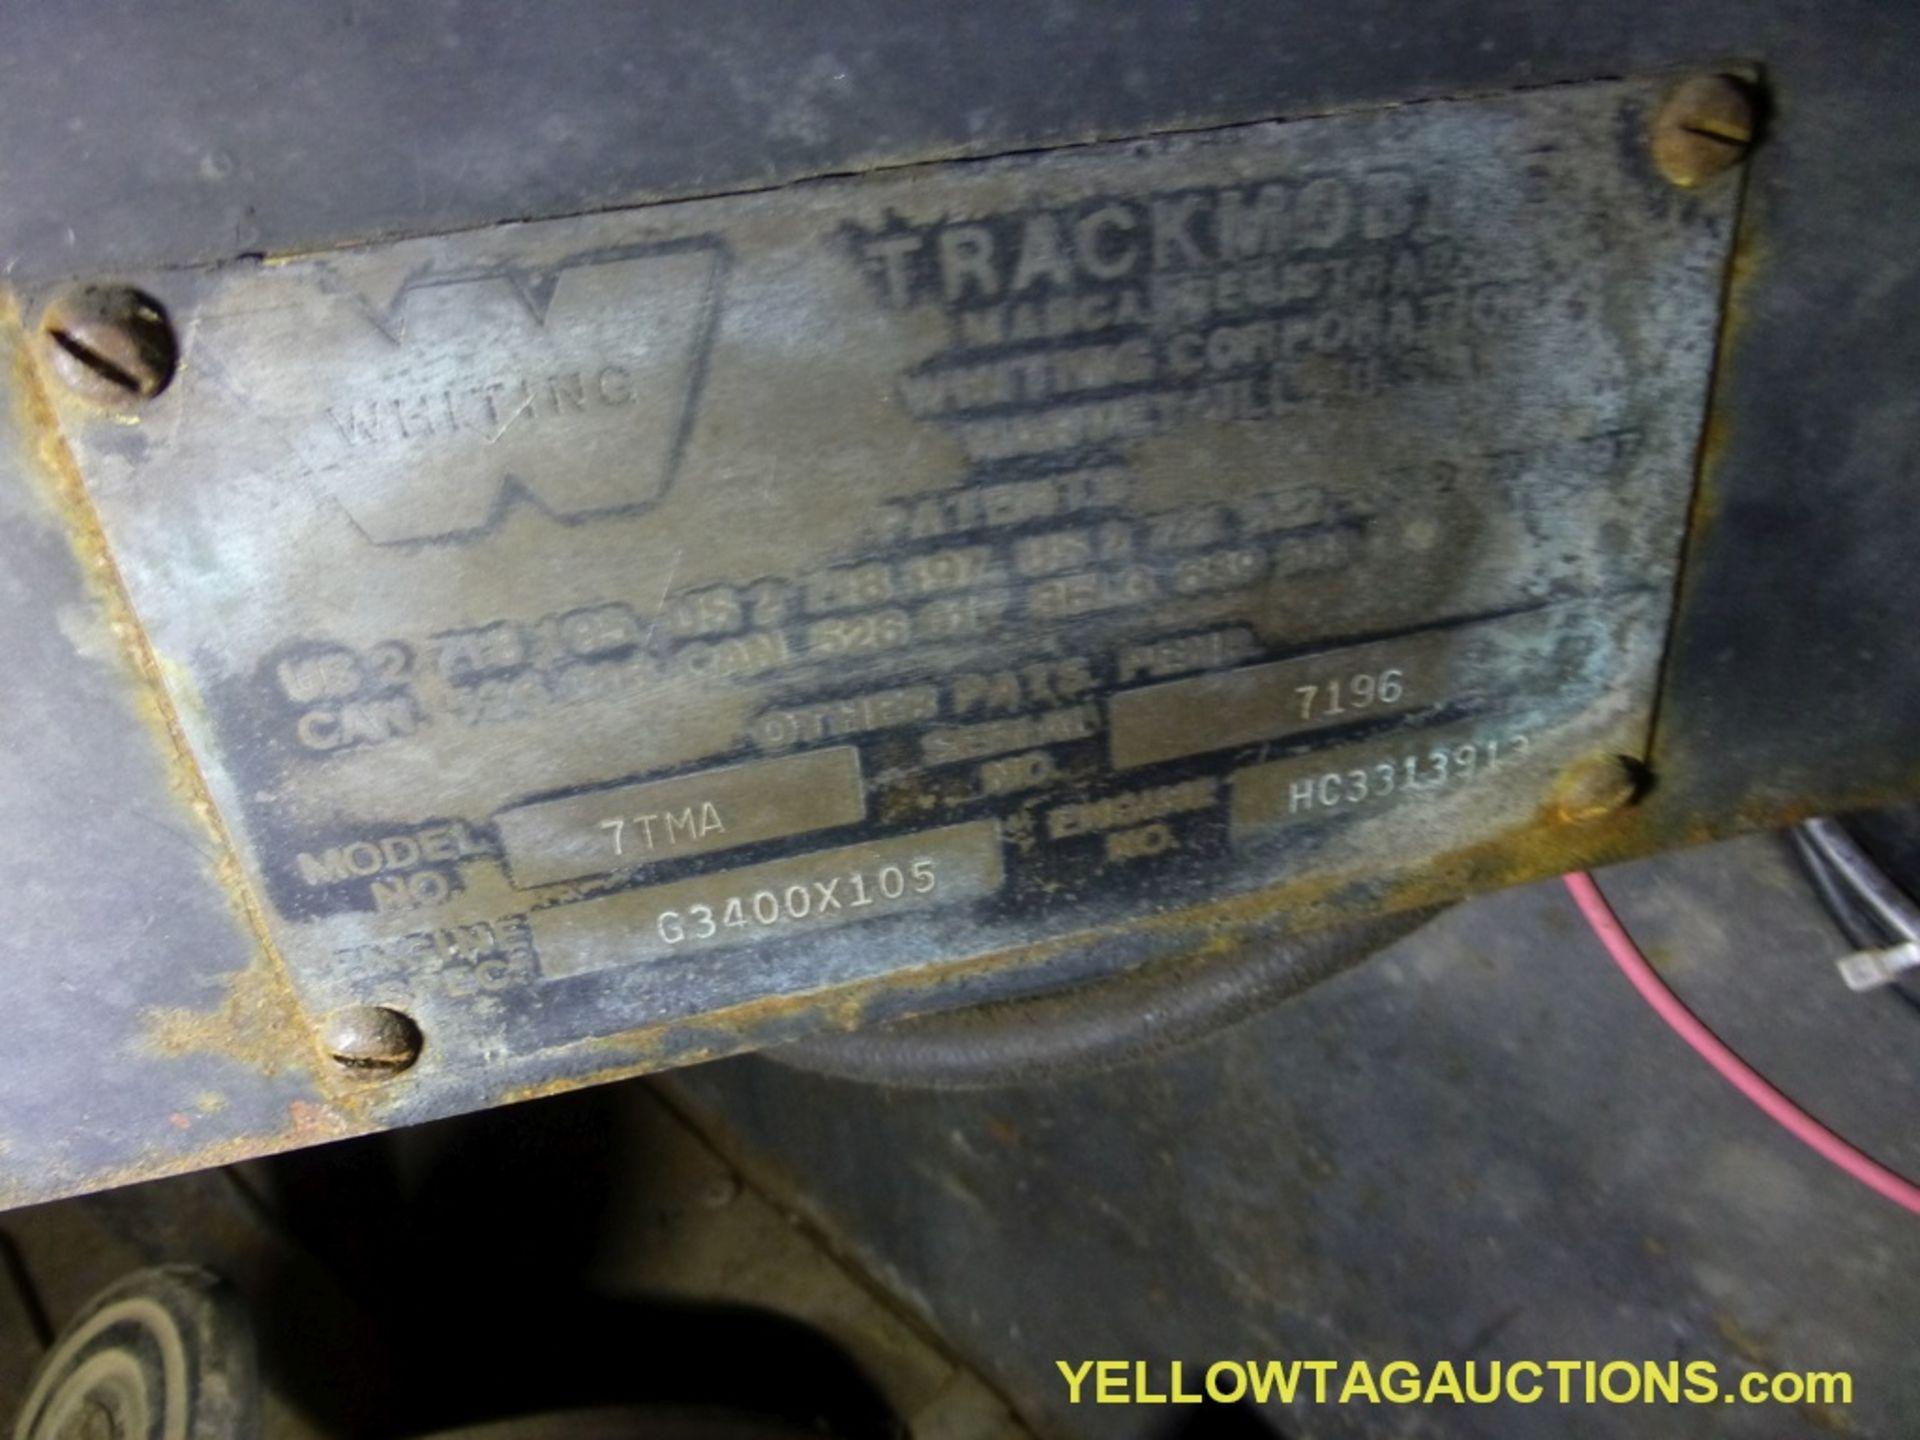 Track Mobile Rail Car Mover | Model No. 7TM; Bad Tie Rod - Image 24 of 42